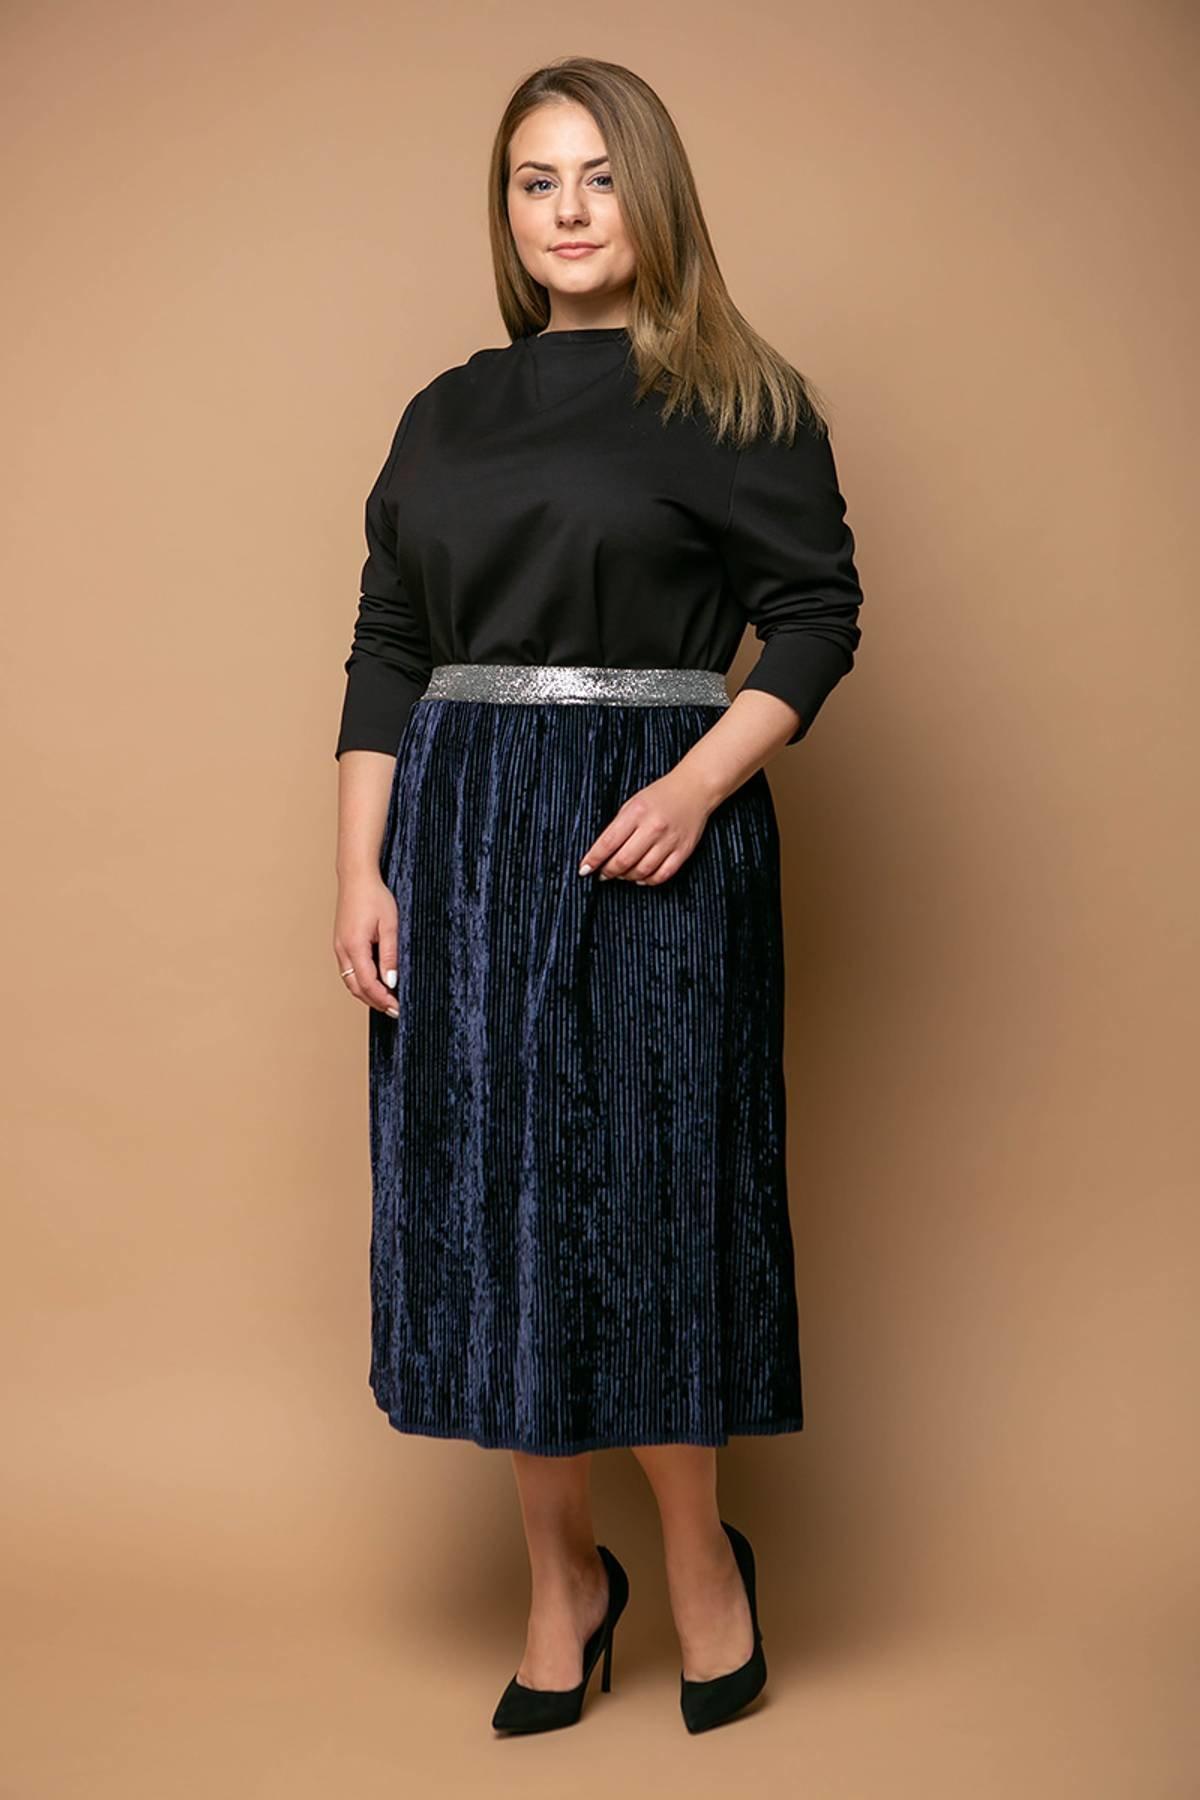 9a2fa0d4133 Темно-синяя юбка MIKAEL - купить недорого — Donna Bella - Та-MIKAEL-2-54